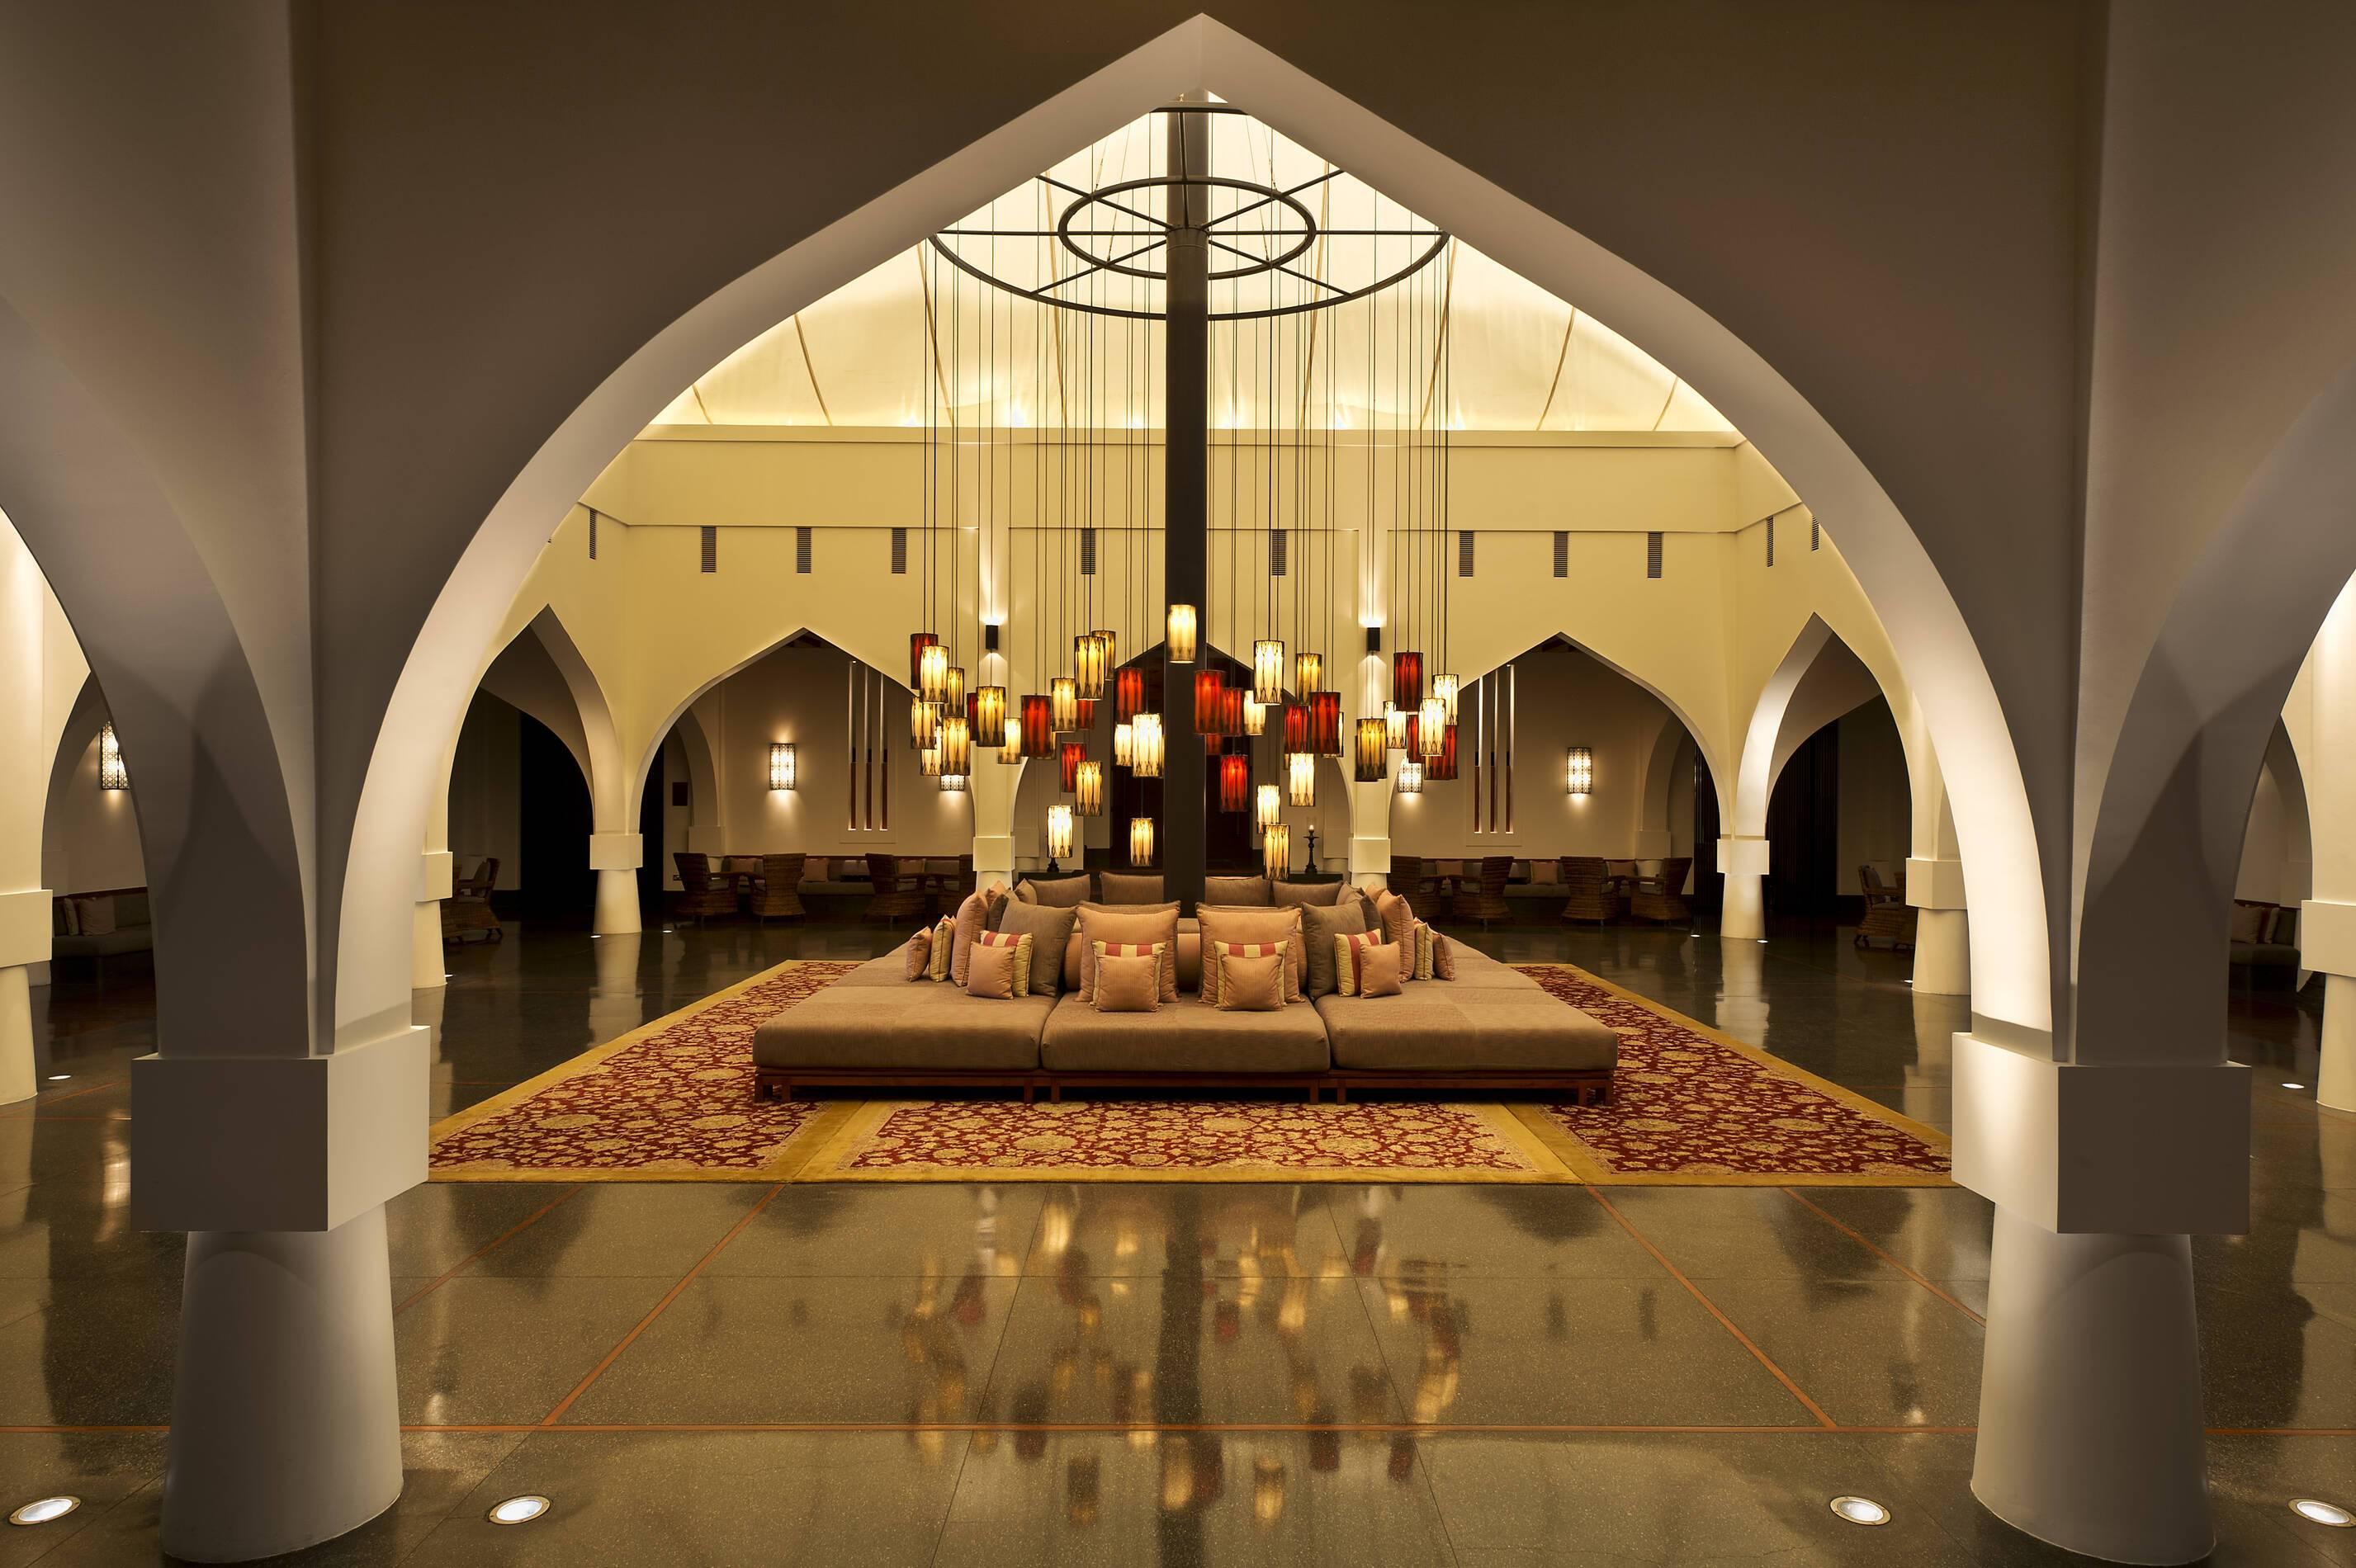 Chedi Muscat Oman Hall